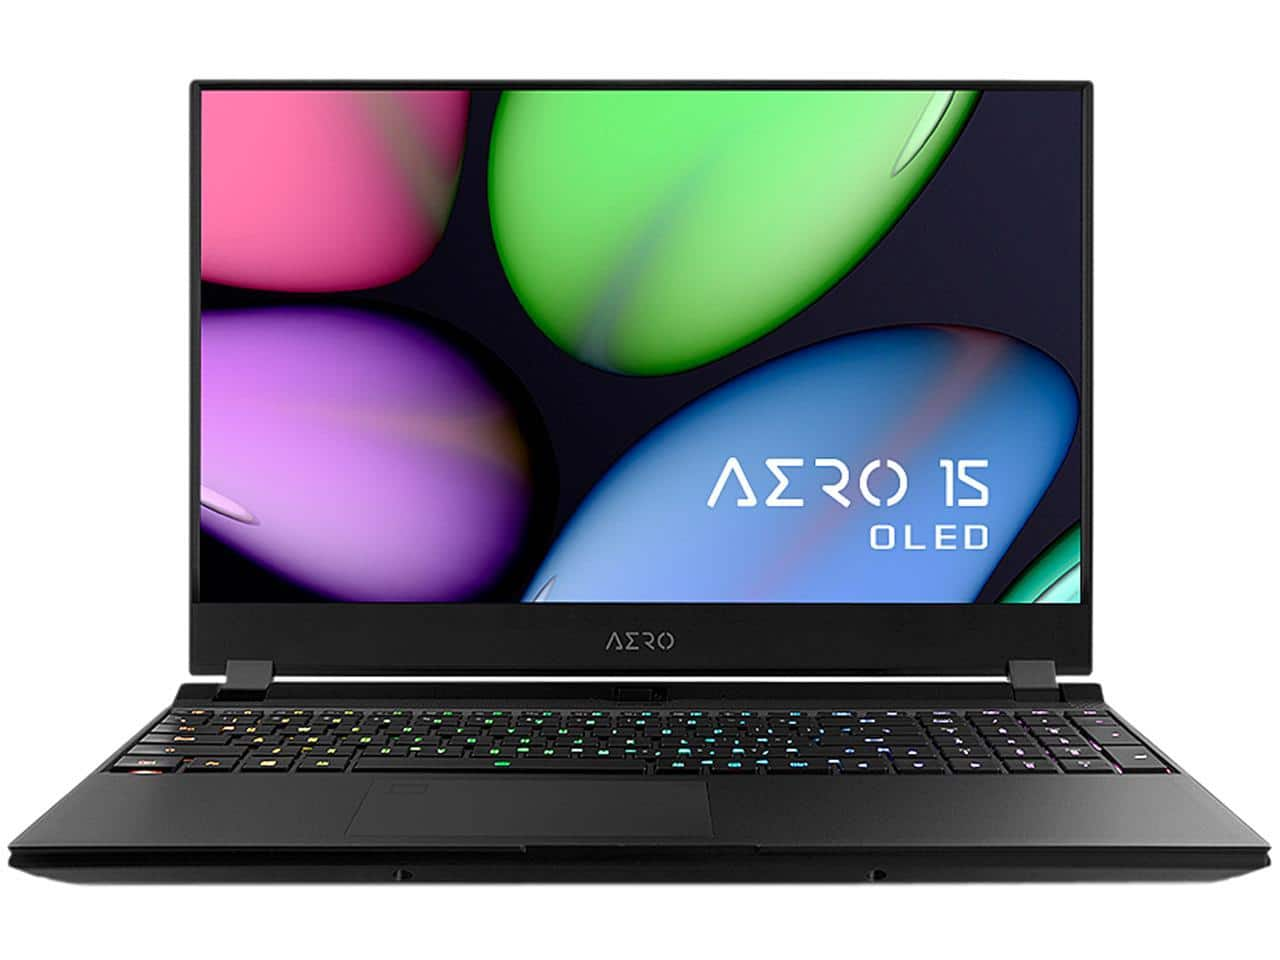 "Gigabyte AERO 15 4K OLED Laptop: i7-9750H, 15.6"" 4K OLED, 8GB DDR4 RAM, 256GB SSD, GTX 1660 Ti $1339"